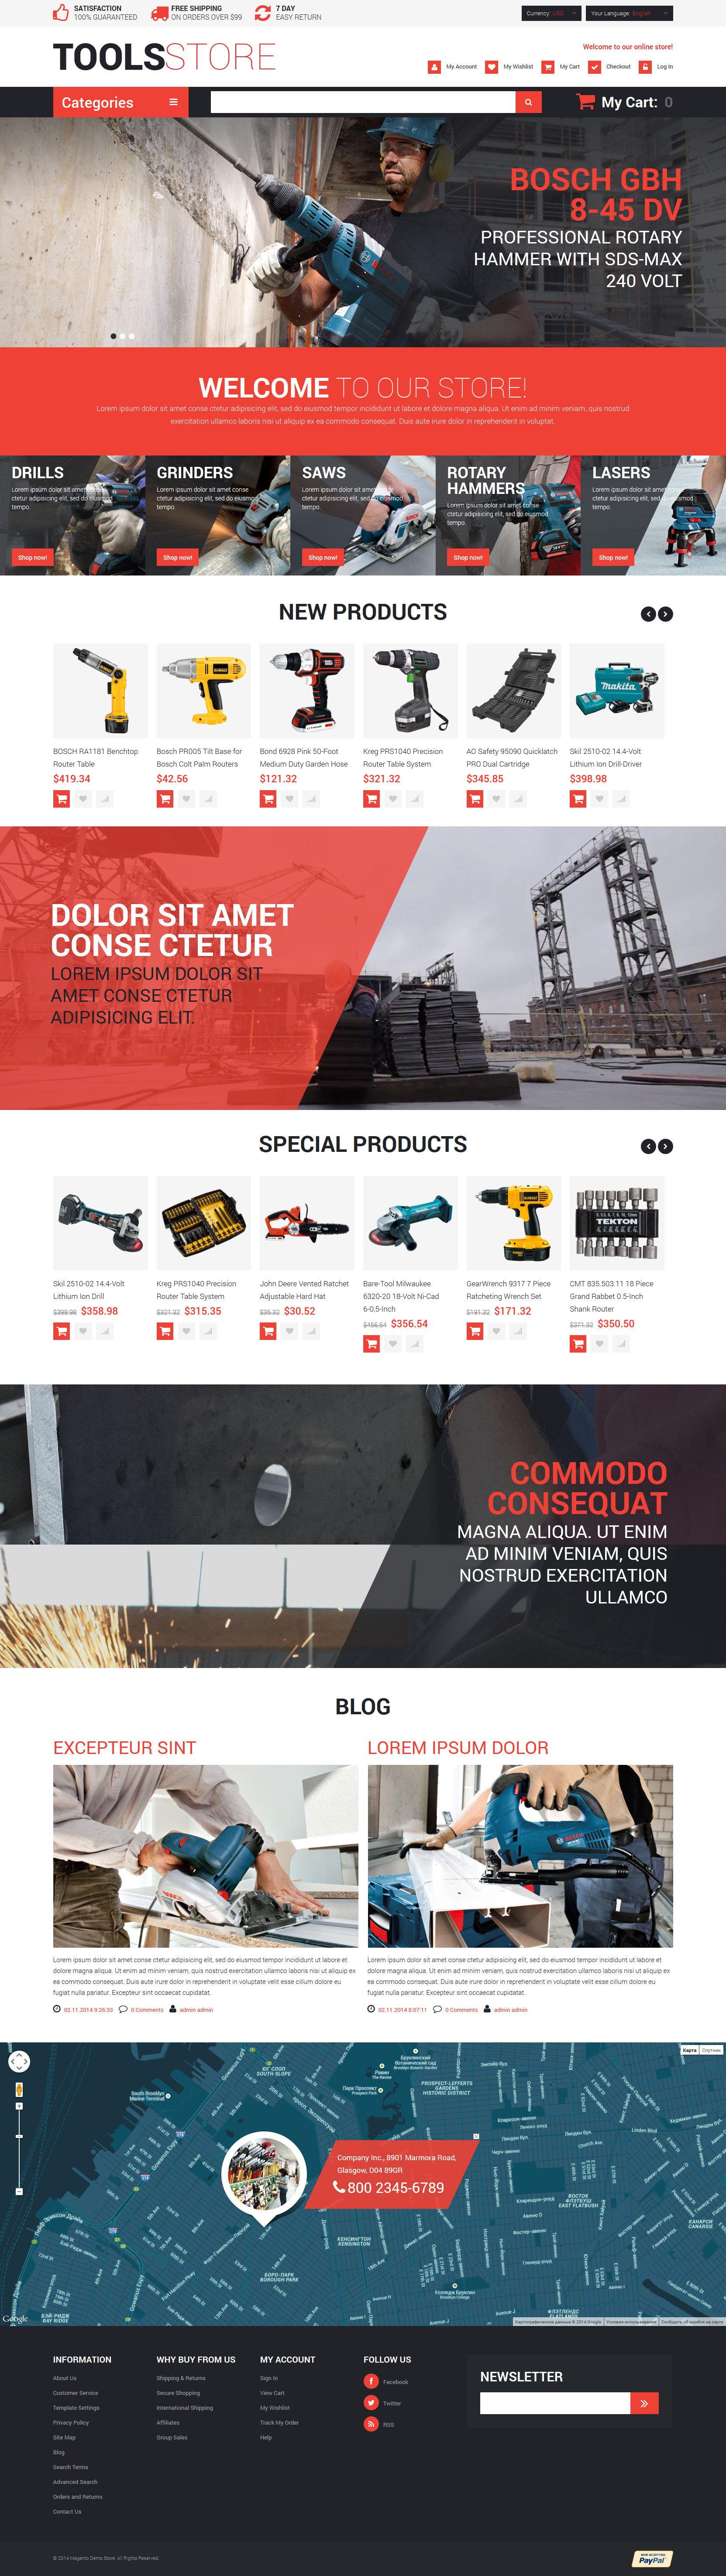 Contractor Tools Magento Theme - screenshot